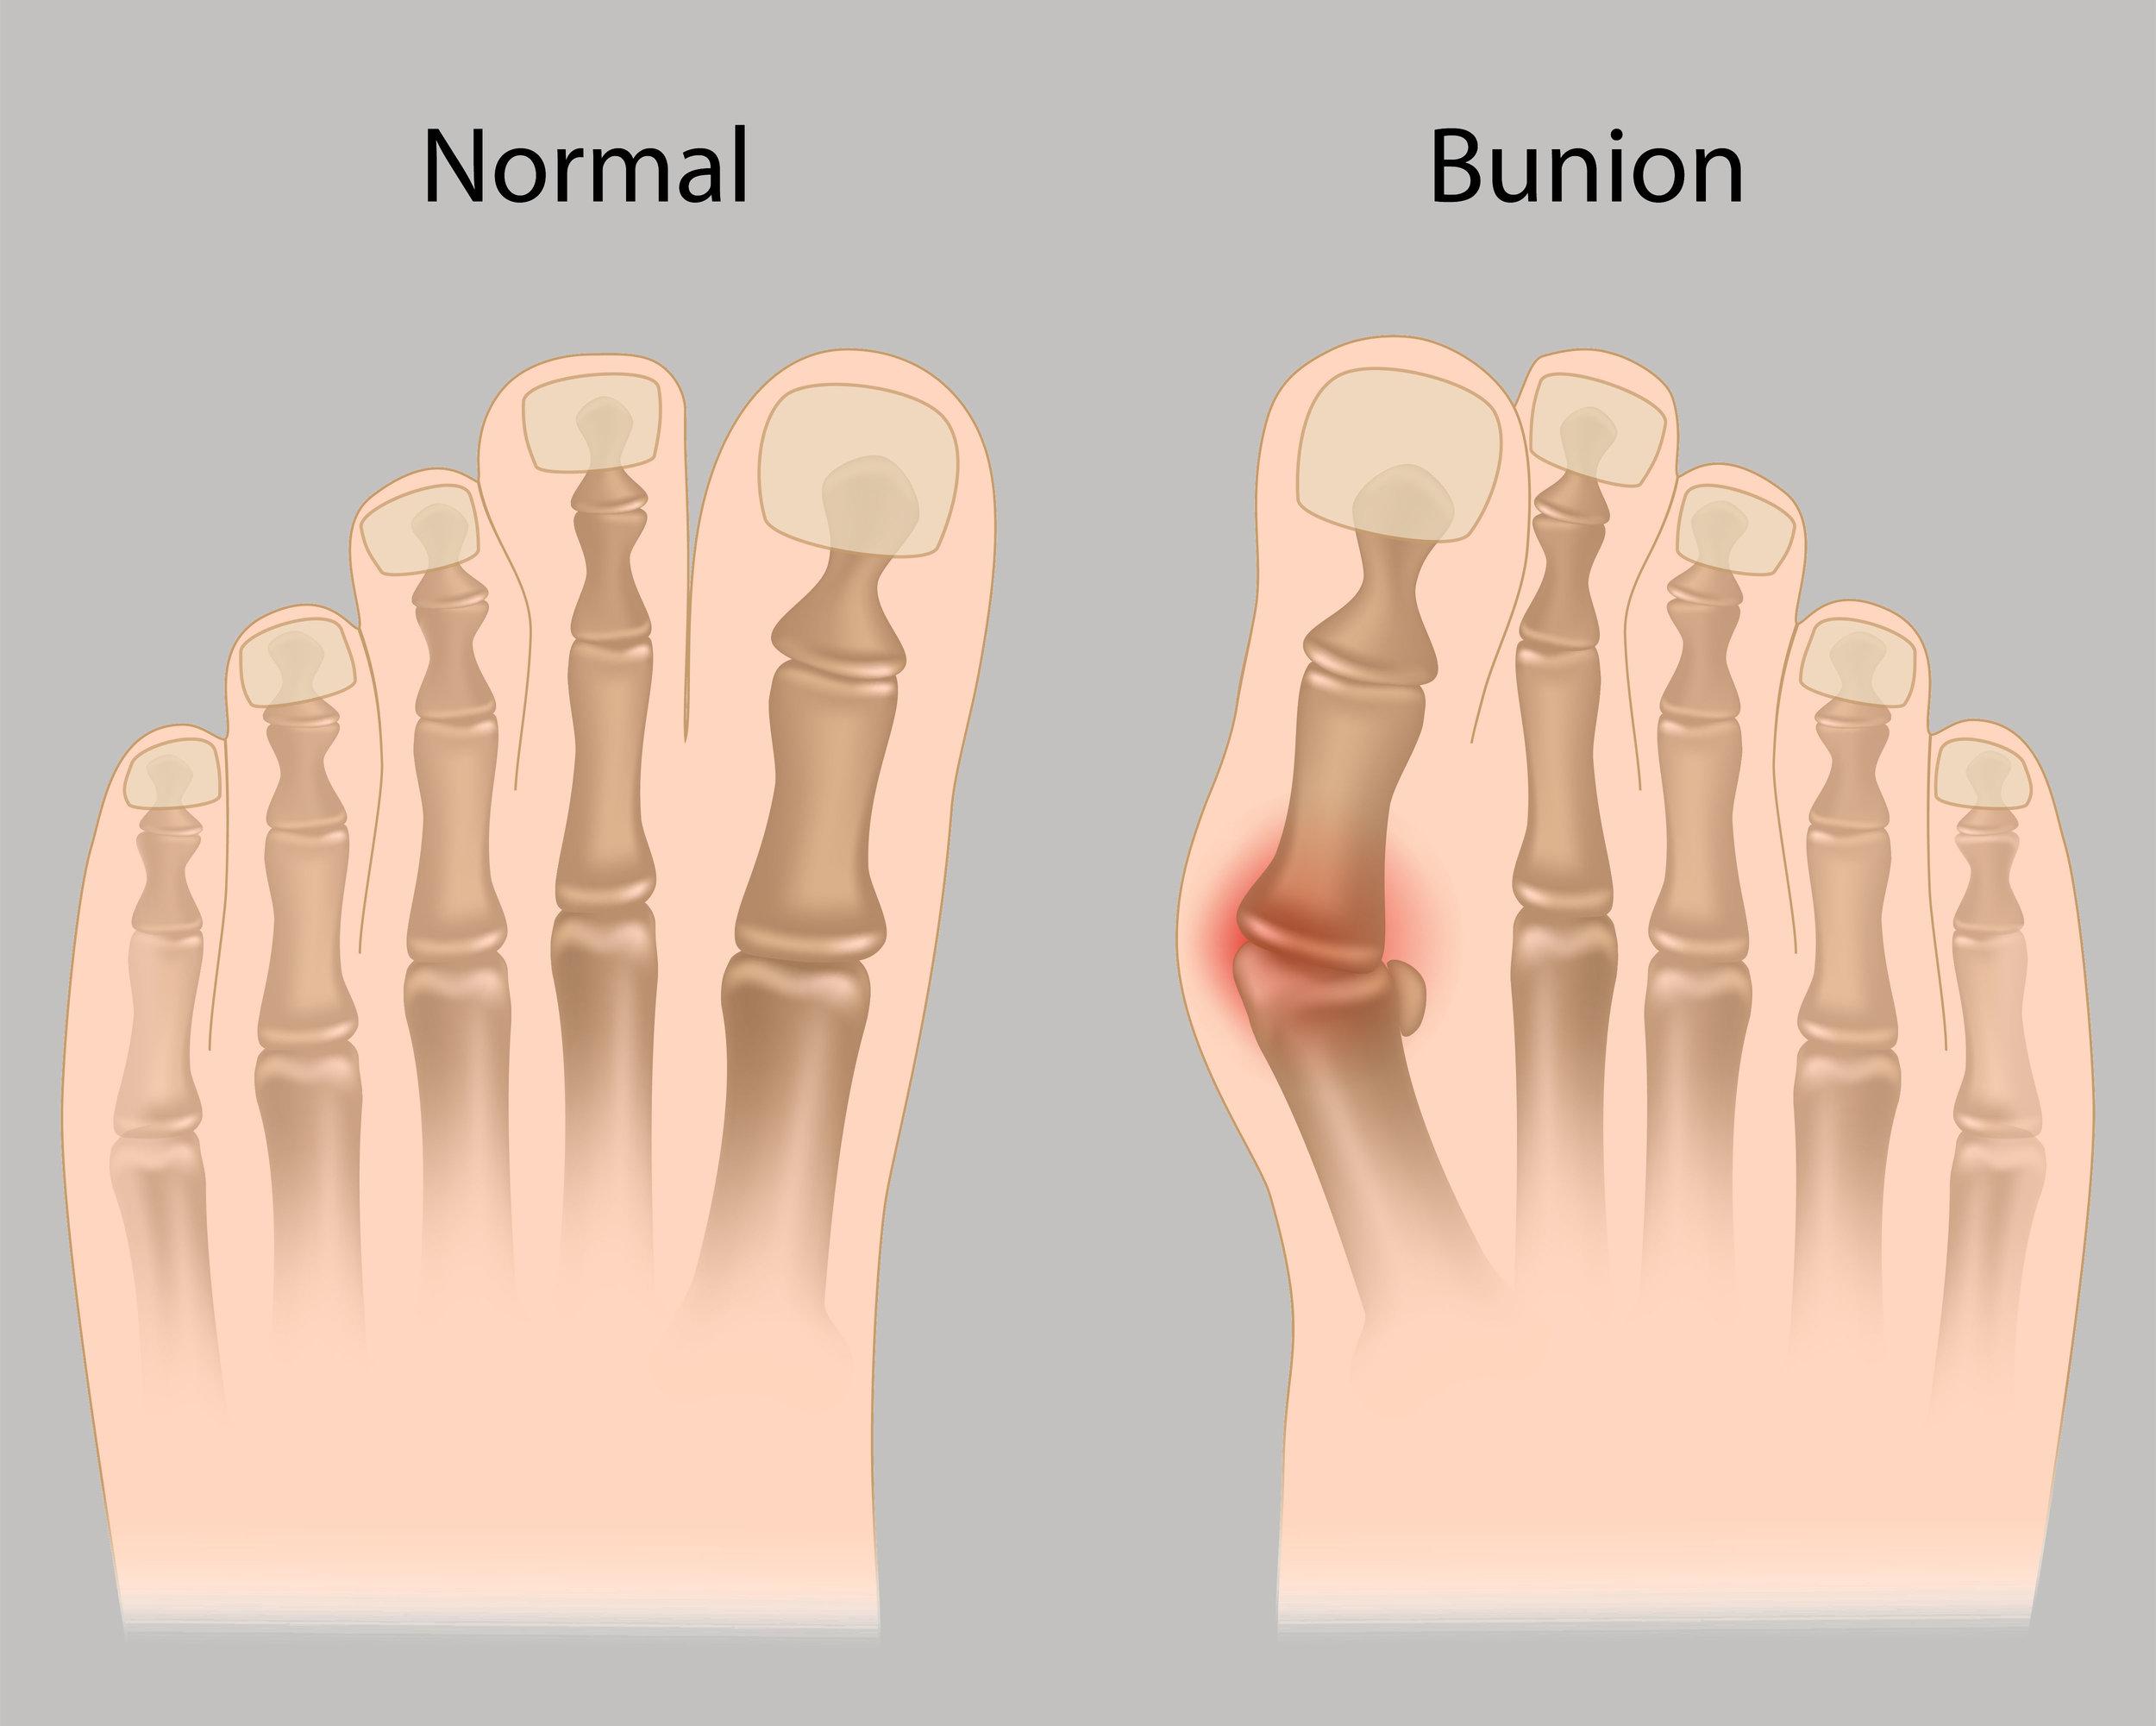 minimally invasive bunion surgery, bunionectomy - foot surgeon in marquette, escanaba, upper peninsula, michigan